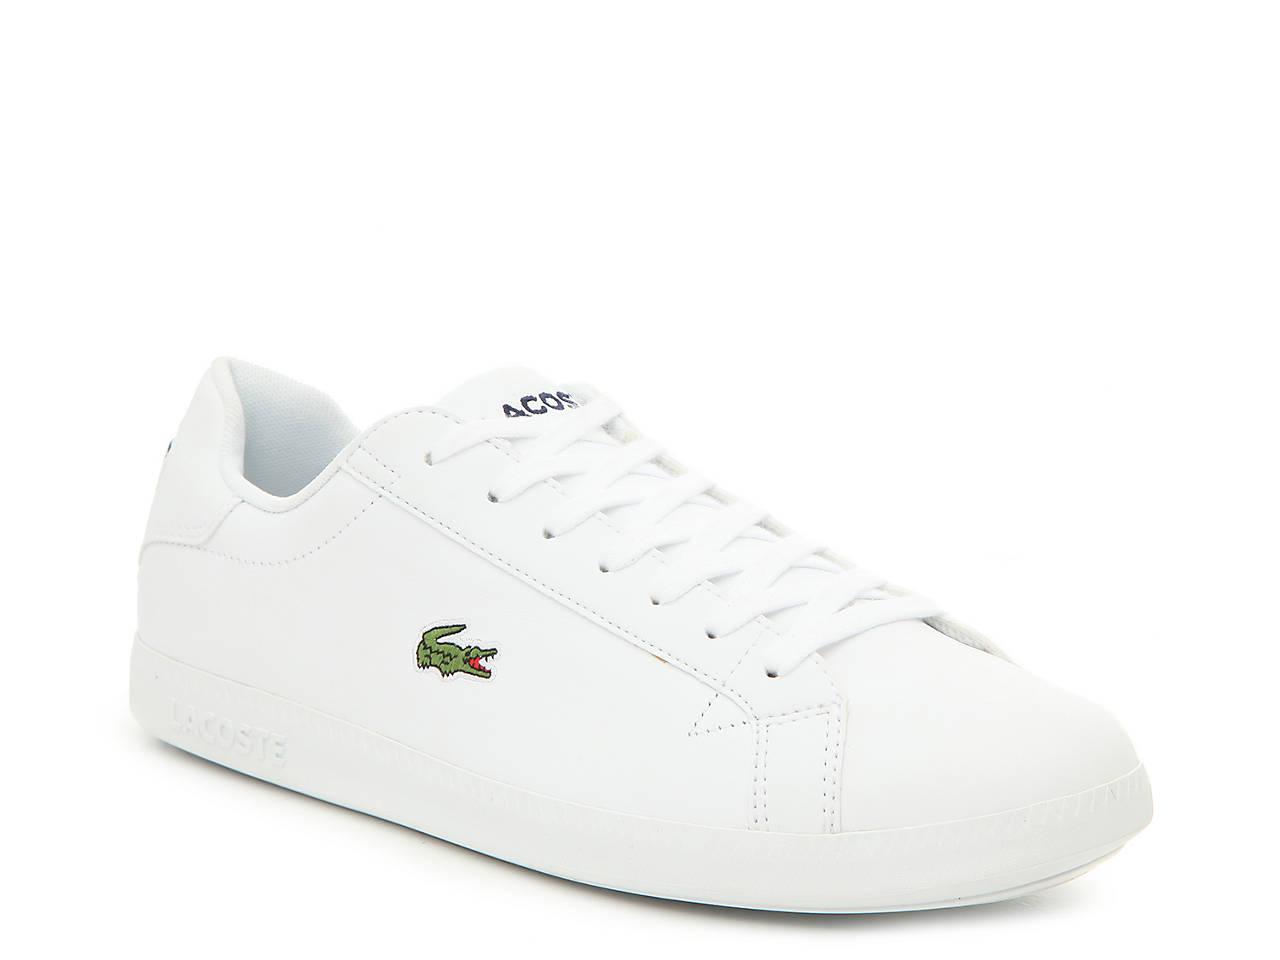 828a90da2 Lacoste Graduate Sneaker Men s Shoes